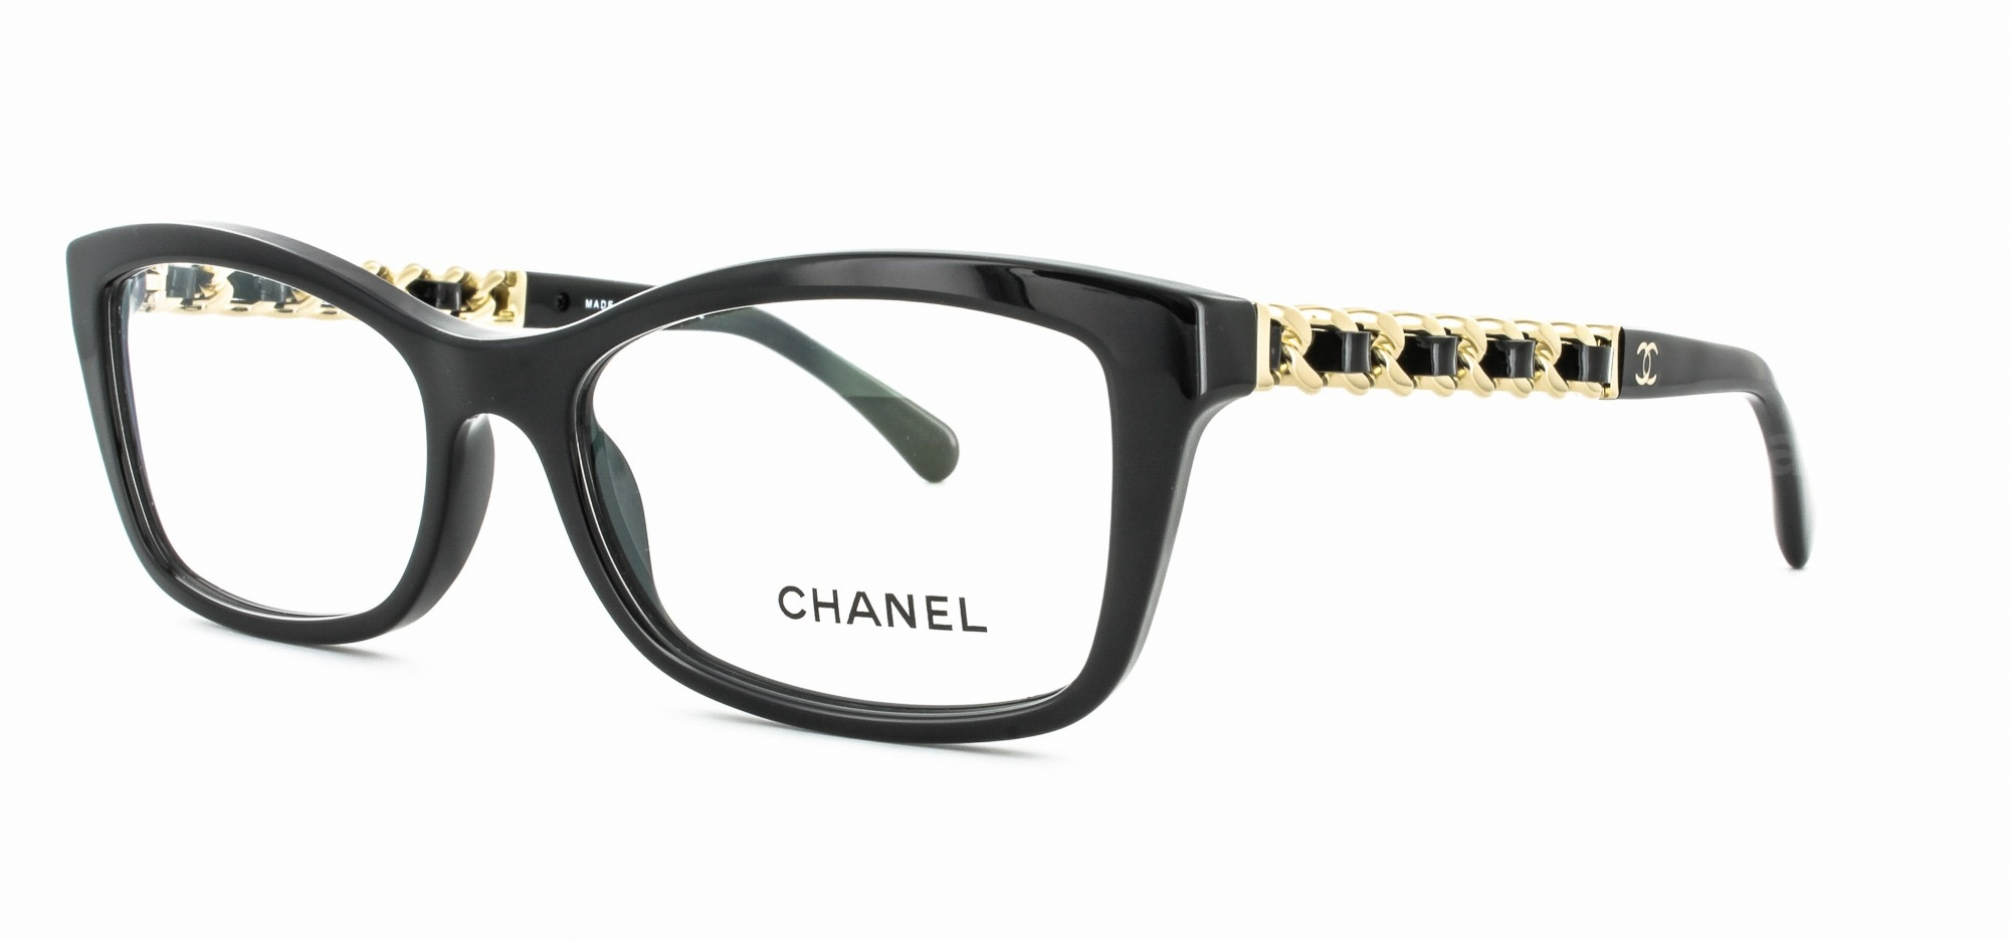 Glasses Frames Chanel : Chanel 3264q Eyeglasses